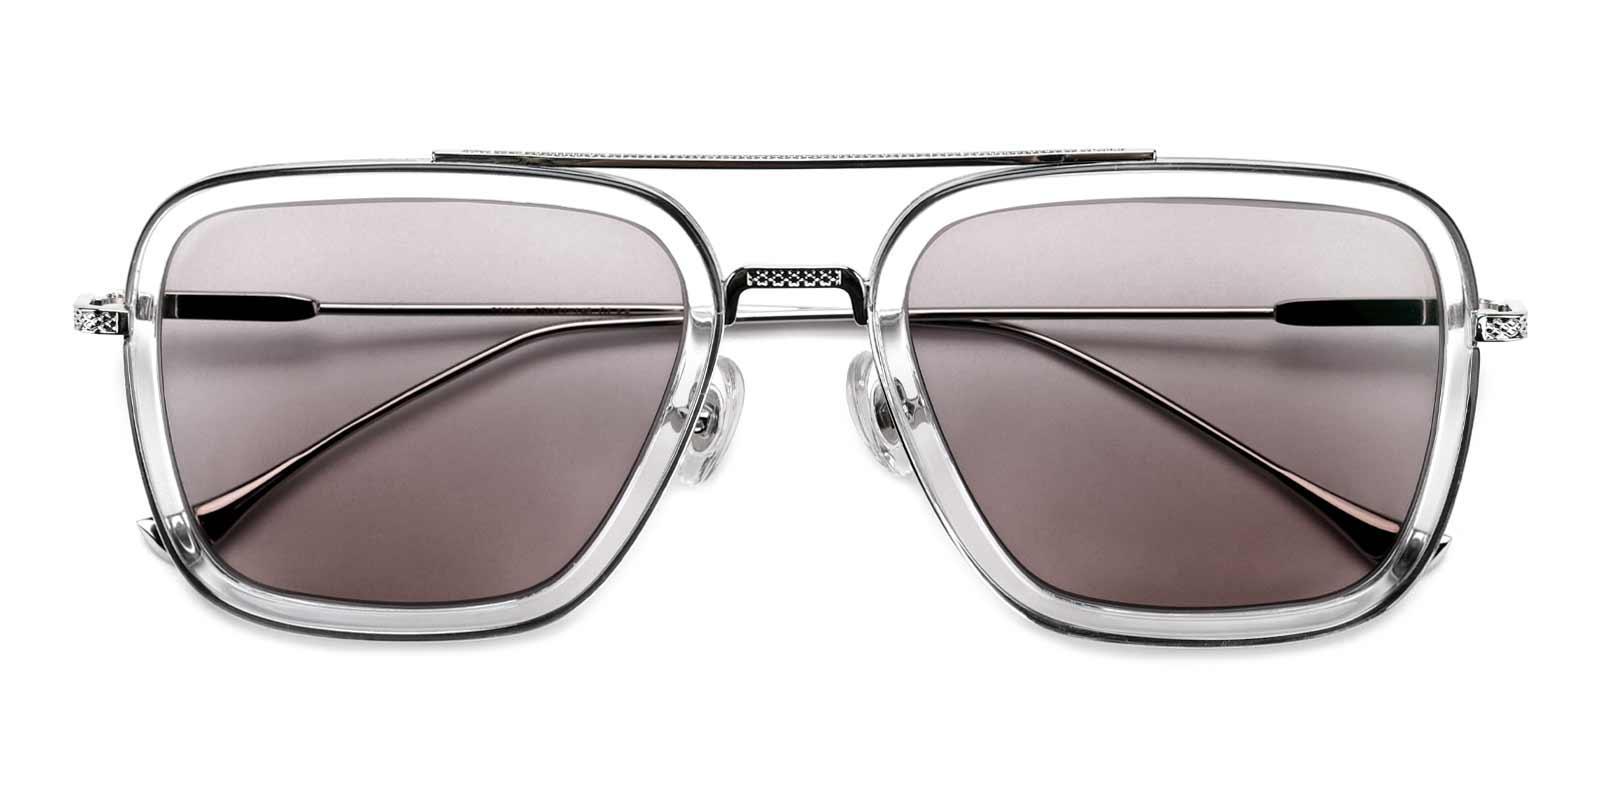 Space Traveler-Gray-Aviator-Plastic-Sunglasses-detail